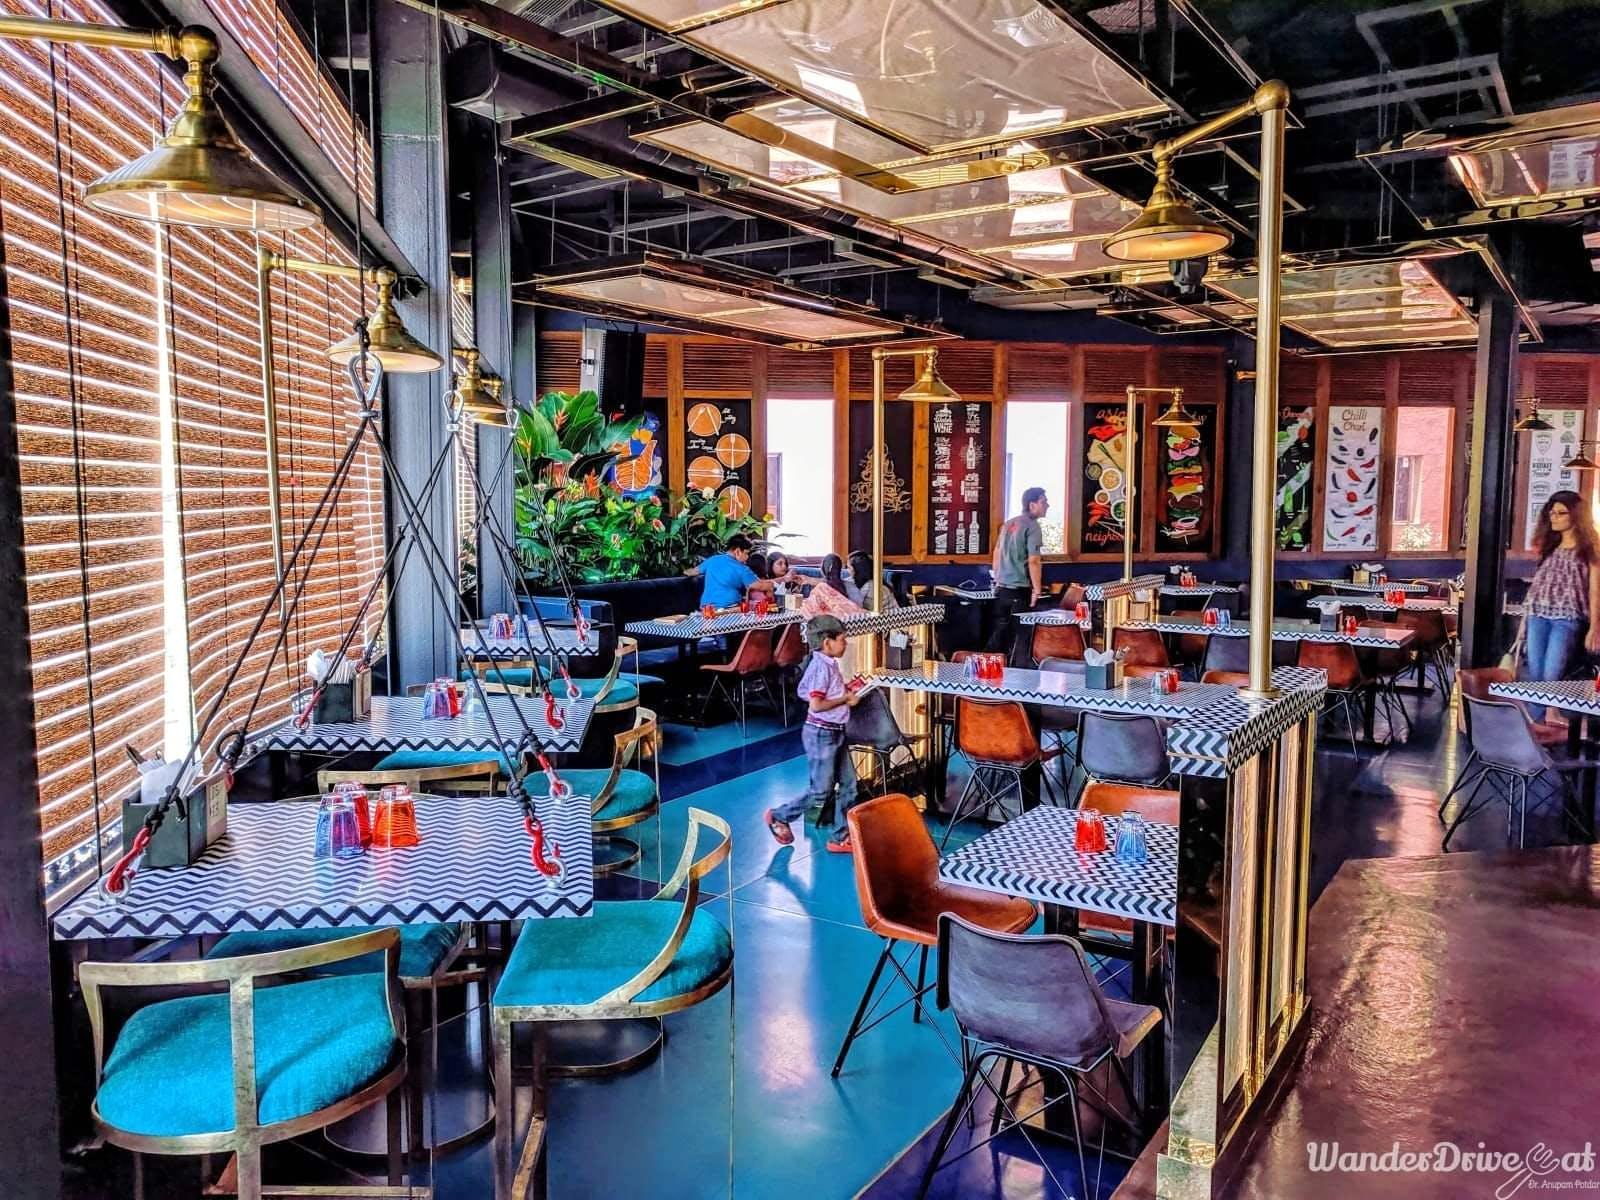 Building,Interior design,Room,Restaurant,Architecture,Furniture,Table,Leisure,House,Bar